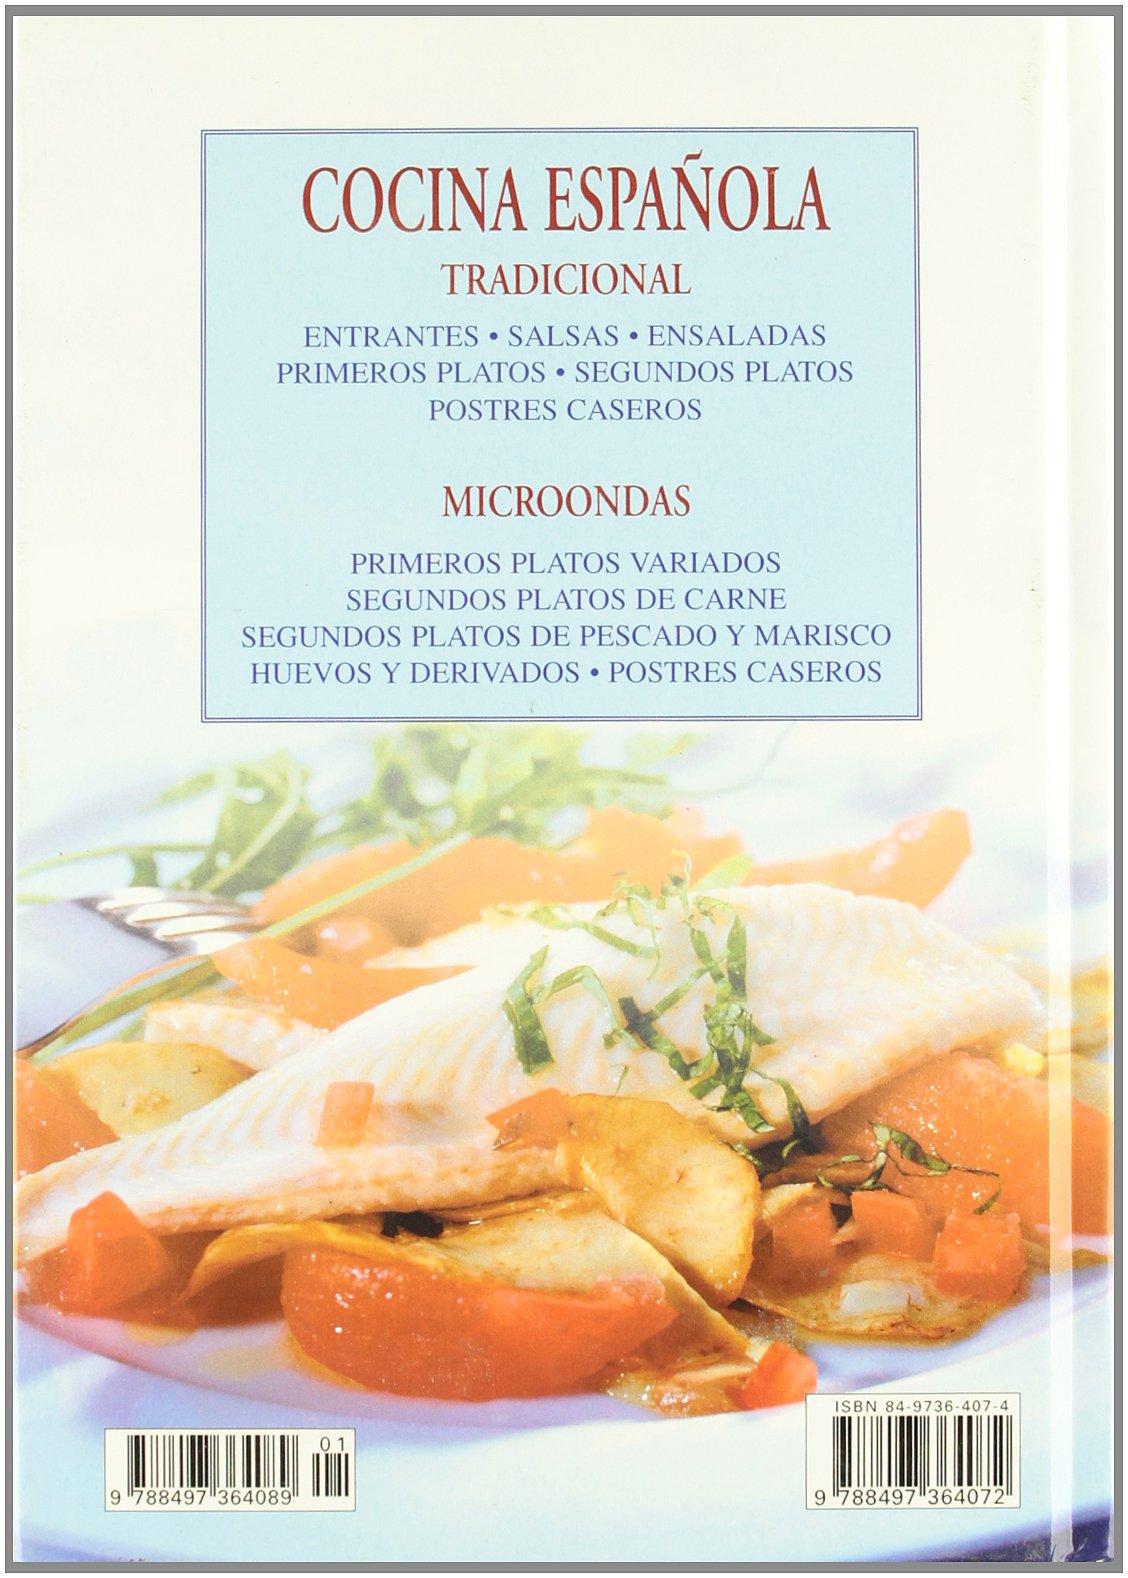 Cocina Espanola Tradicional y de Microondas (Spanish Edition): Gloria Sanjuan: 9788497364072: Amazon.com: Books